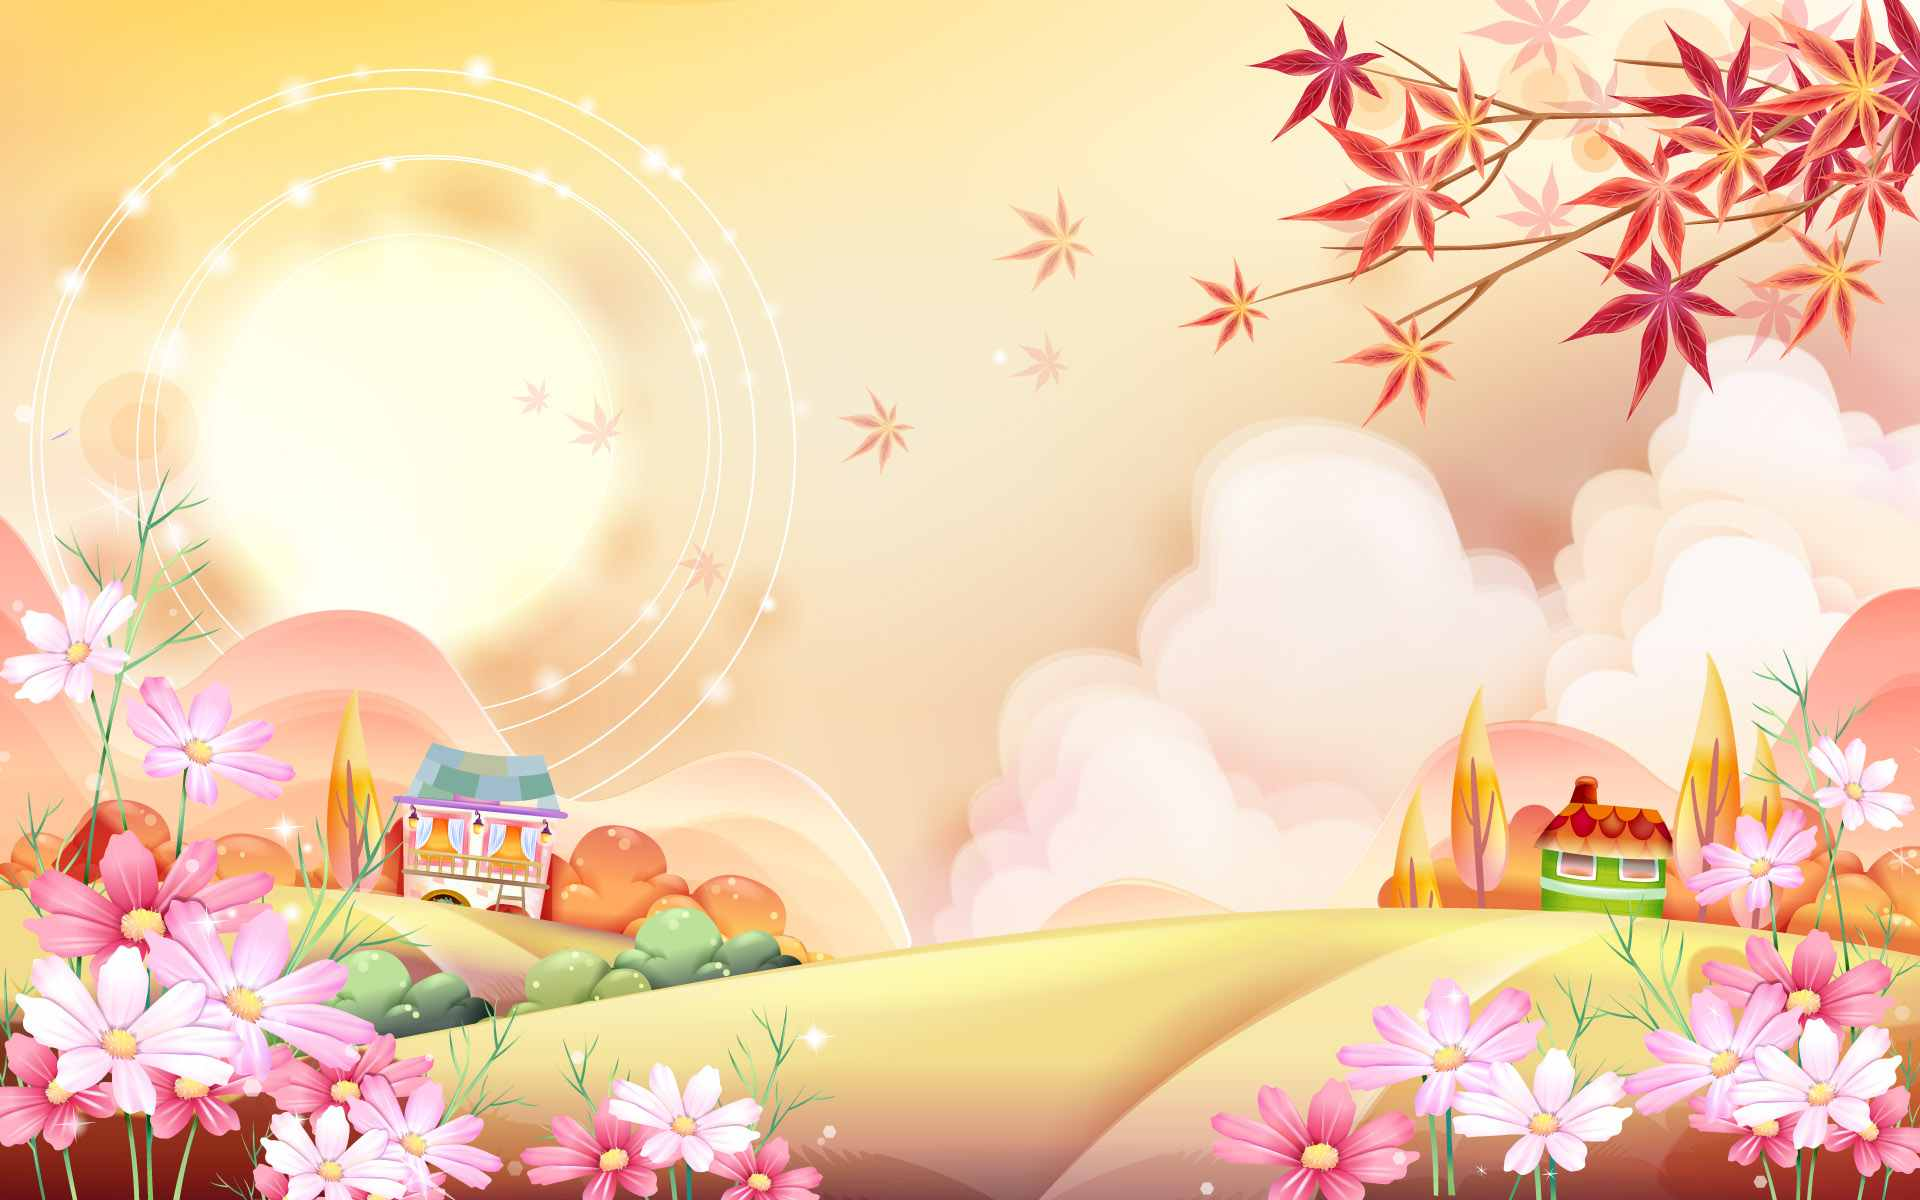 Artistic Desktop Backgrounds 1920x1200